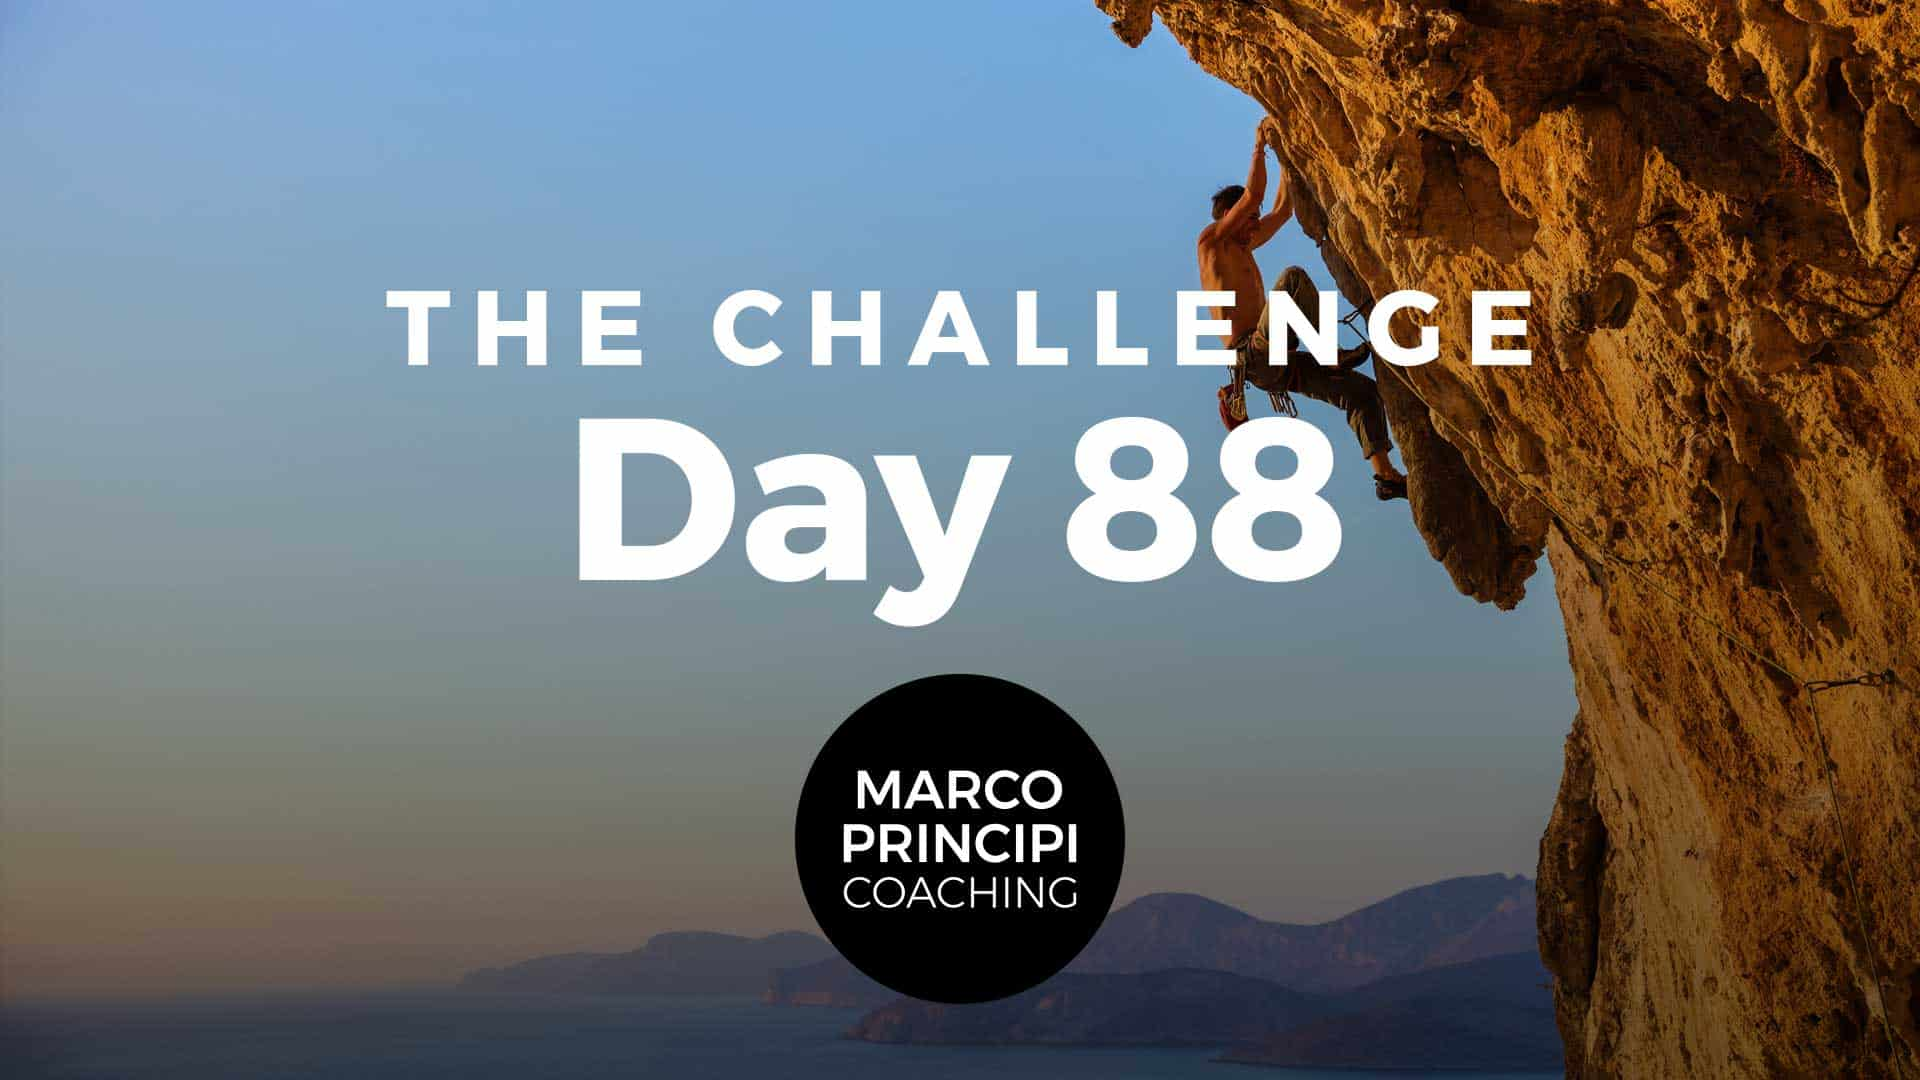 Marco Principi Coaching Challenge Day 88